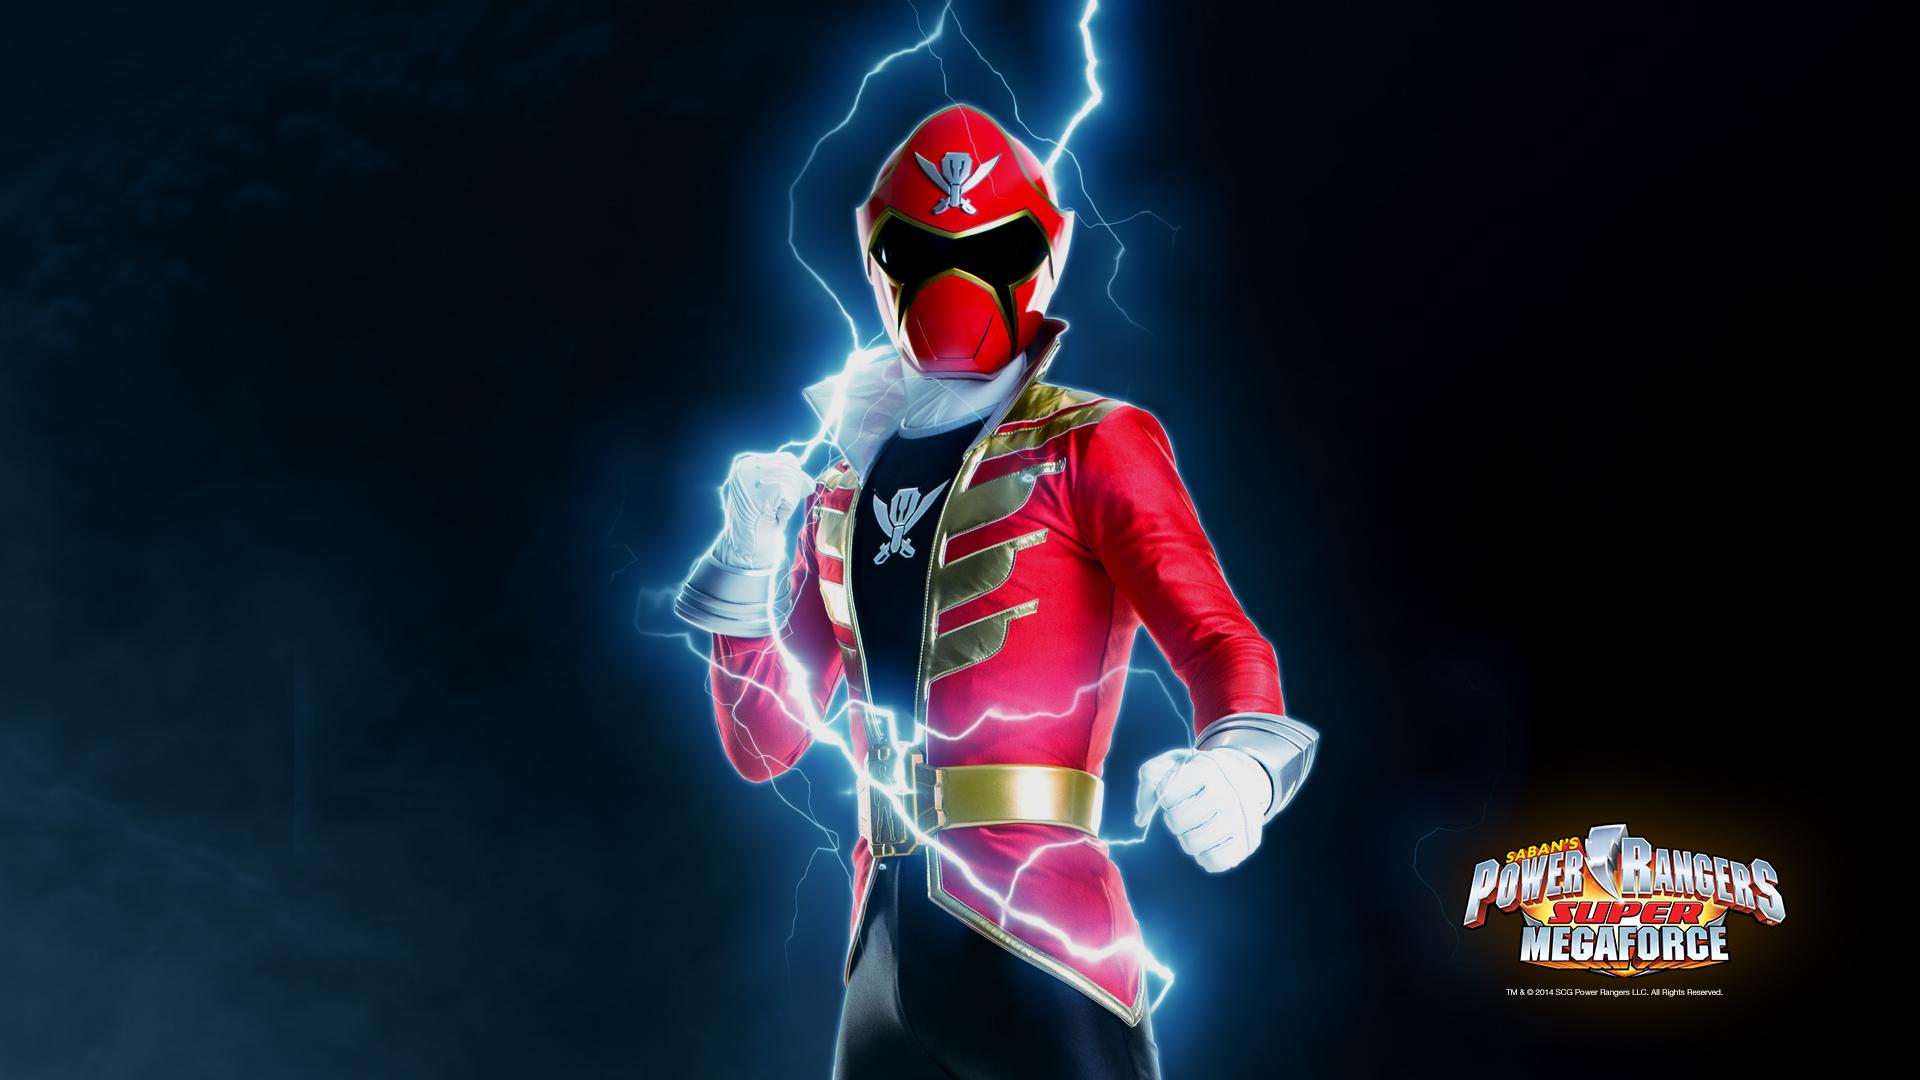 Power Rangers Super Megaforce HD Wallpaper